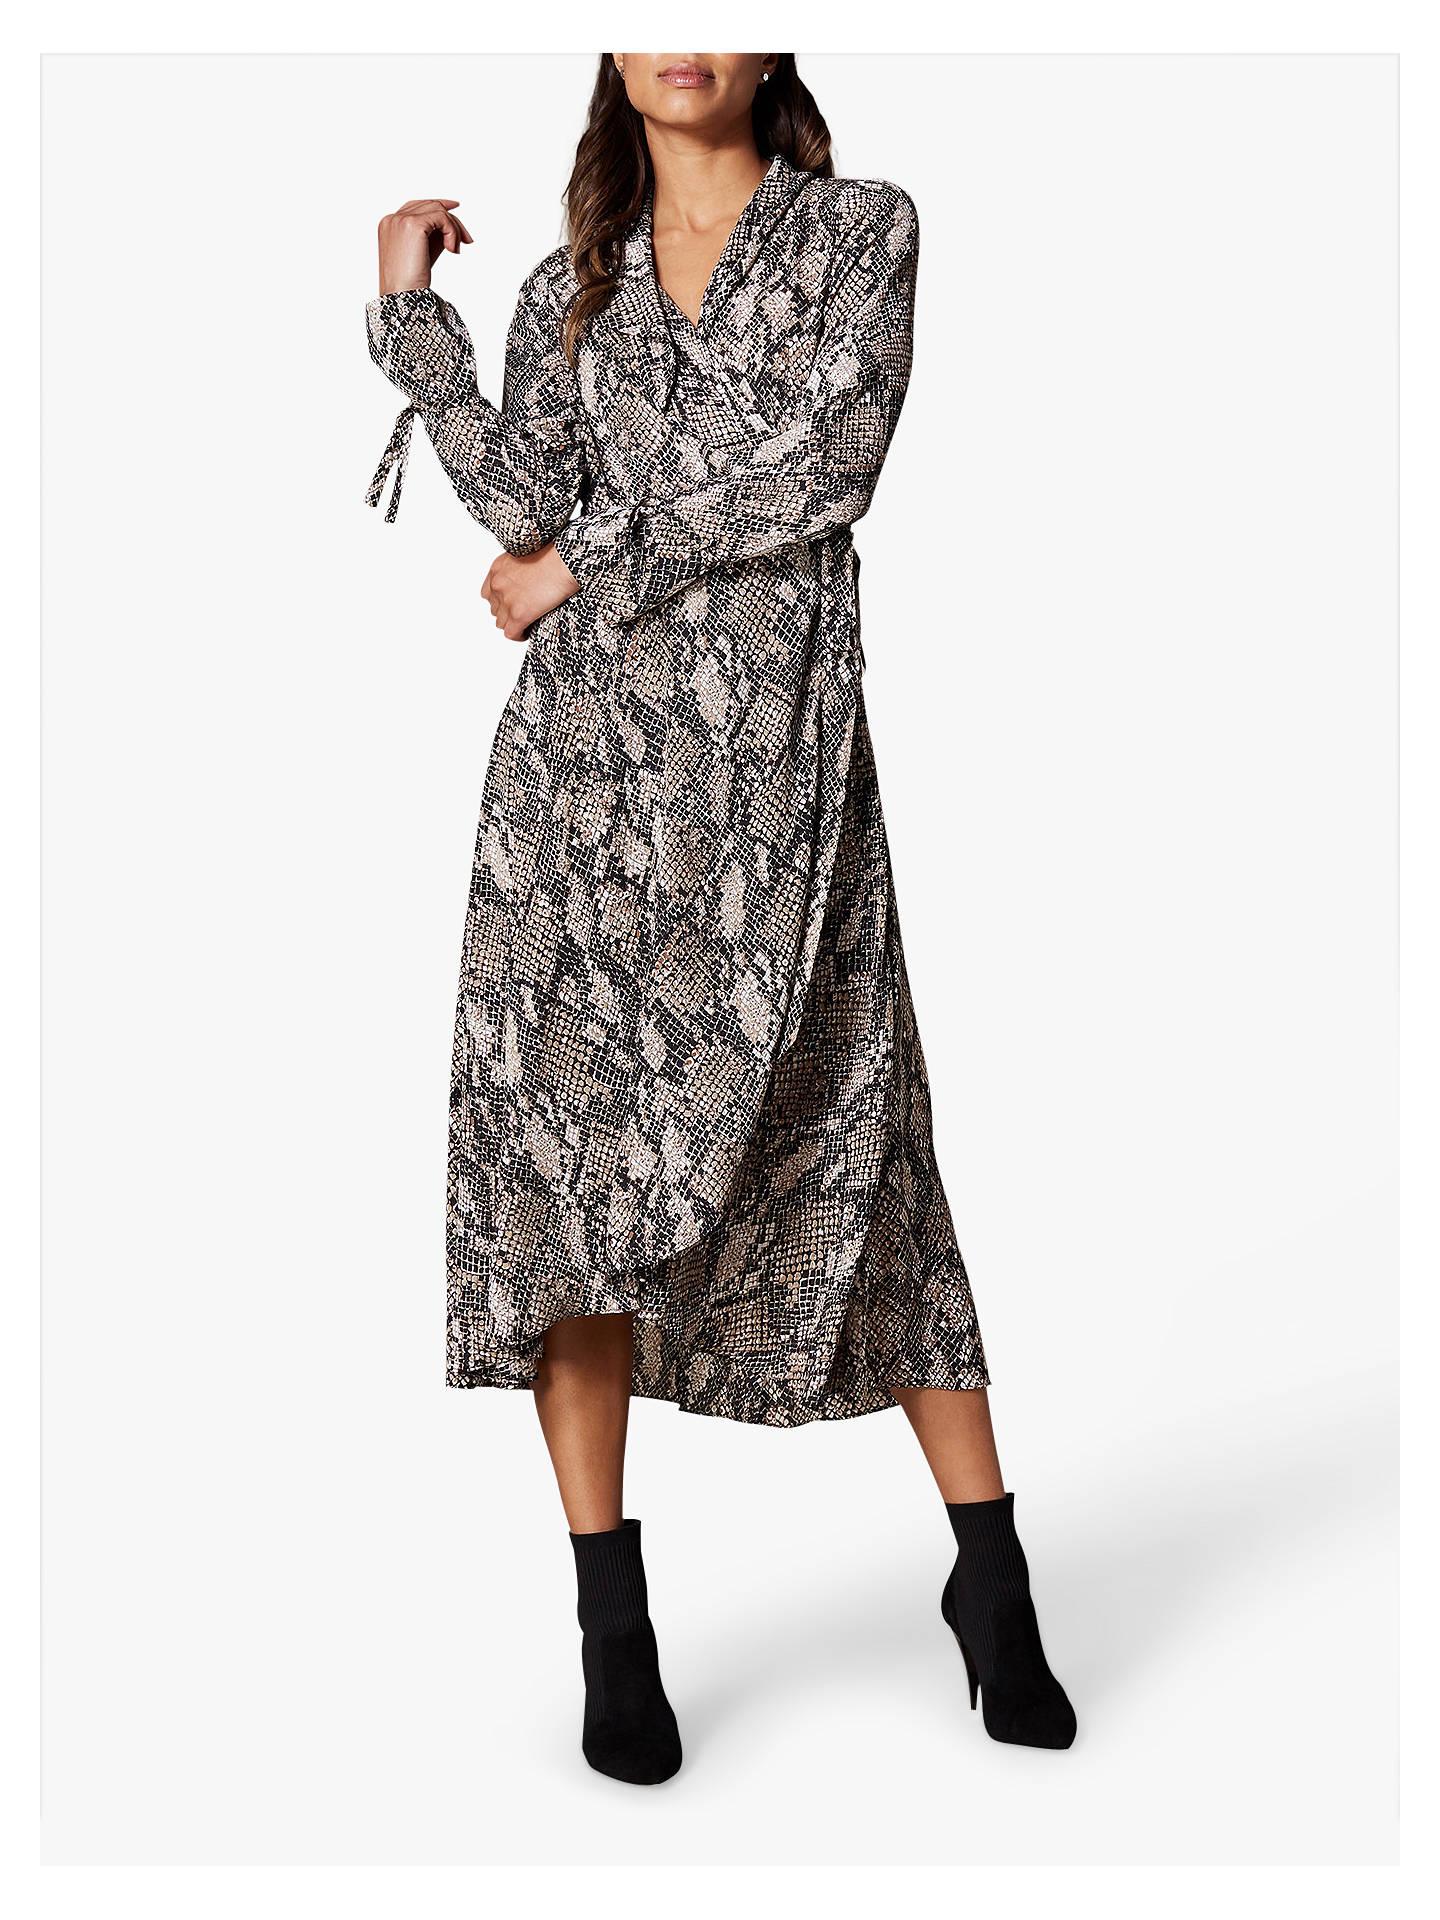 41fd05c81536 Buy Karen Millen Snakeskin Print Maxi Dress, Multi, 6 Online at  johnlewis.com ...